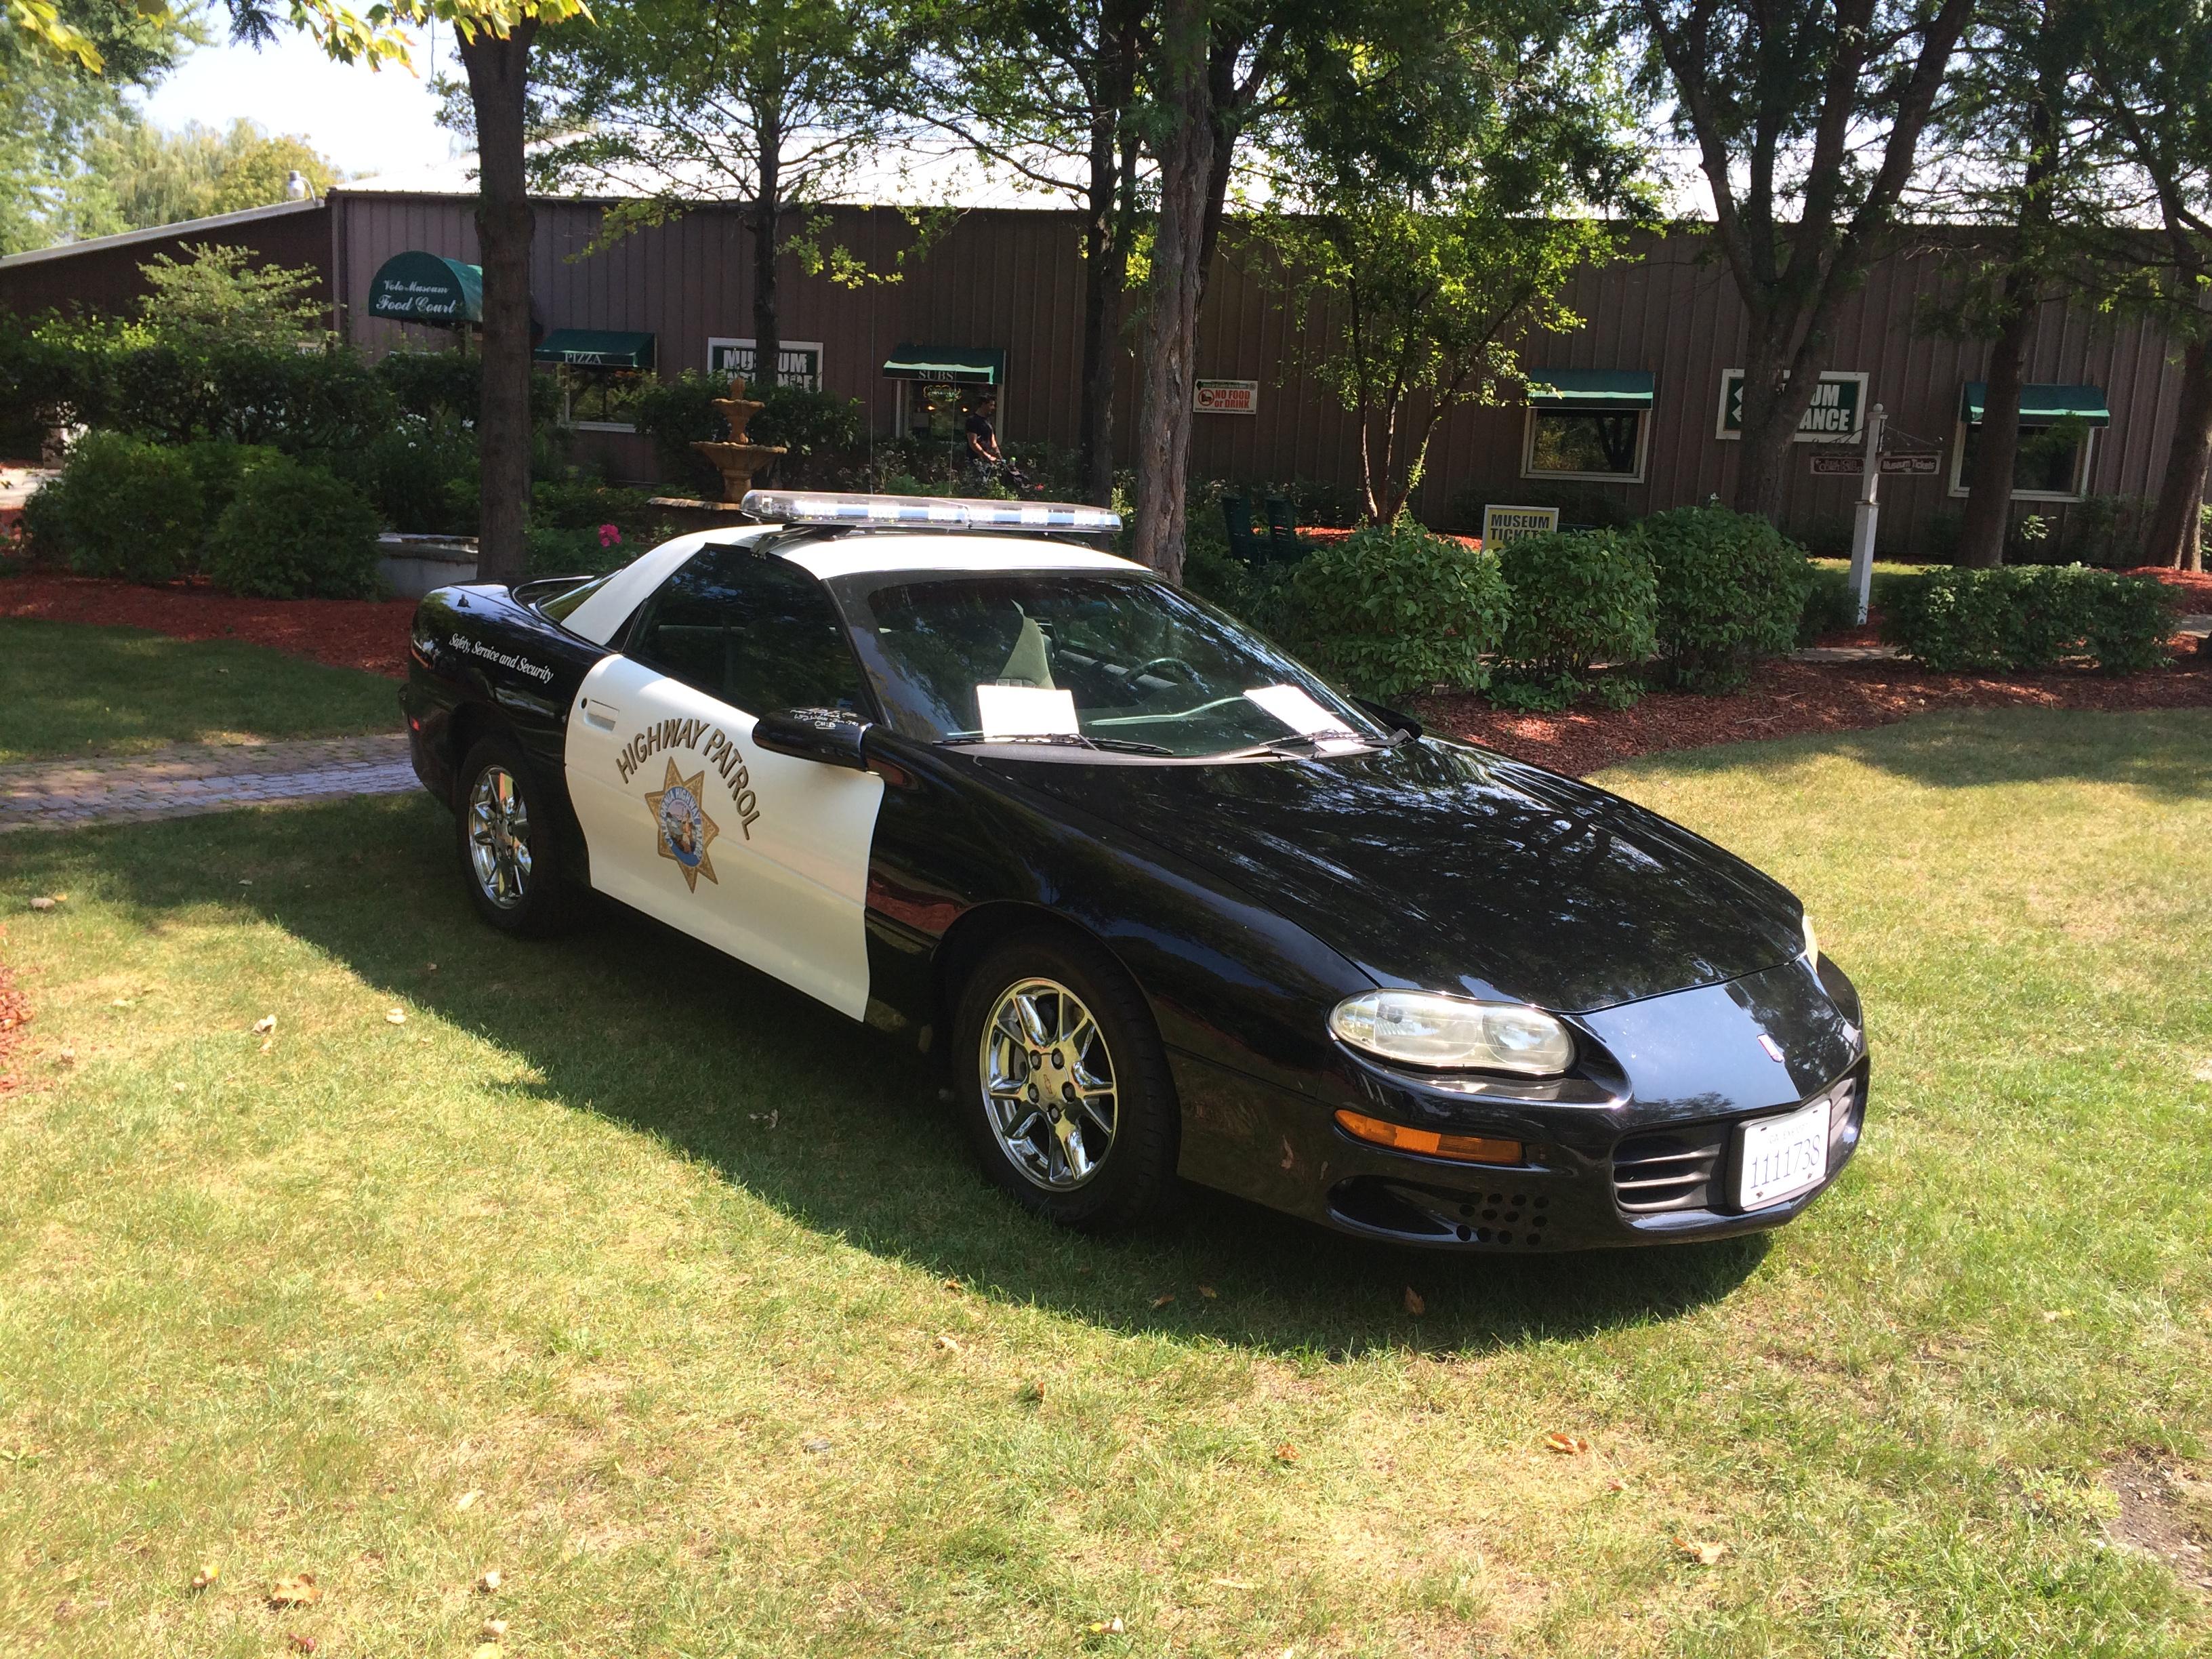 Camaro.police.car